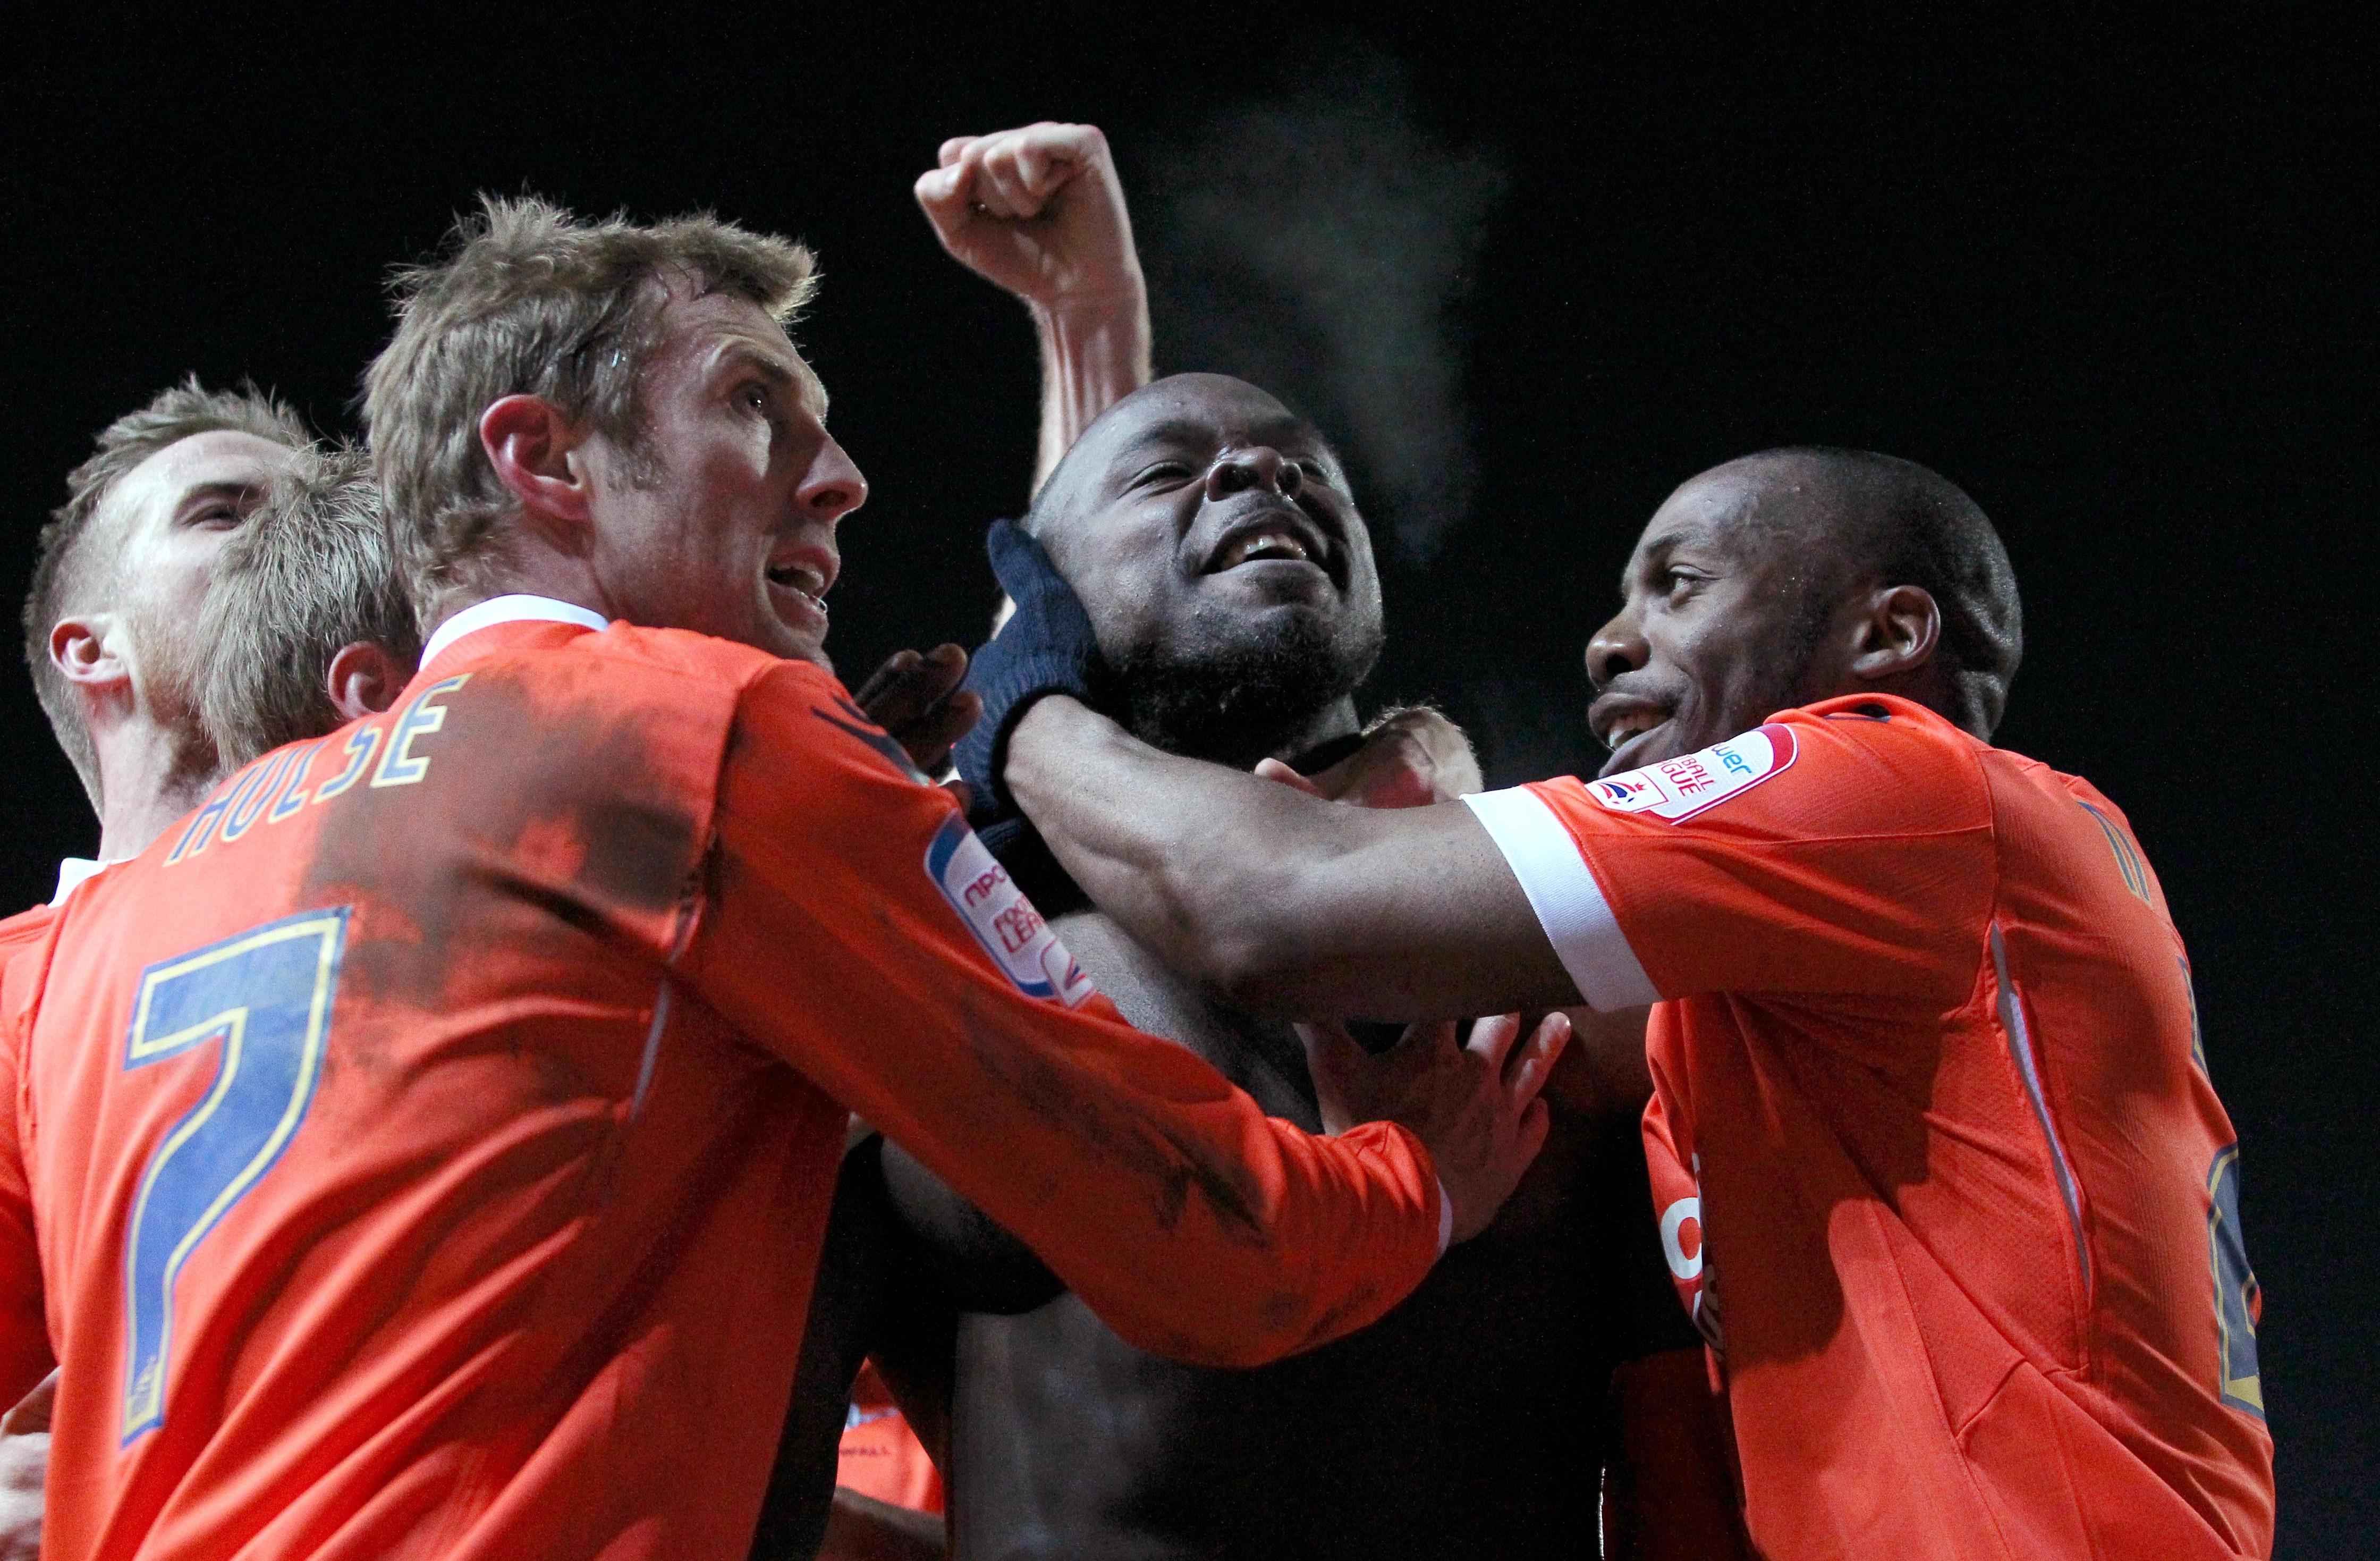 Danny Shittu header helps Millwall past Blackburn and into FA Cup semi-finals